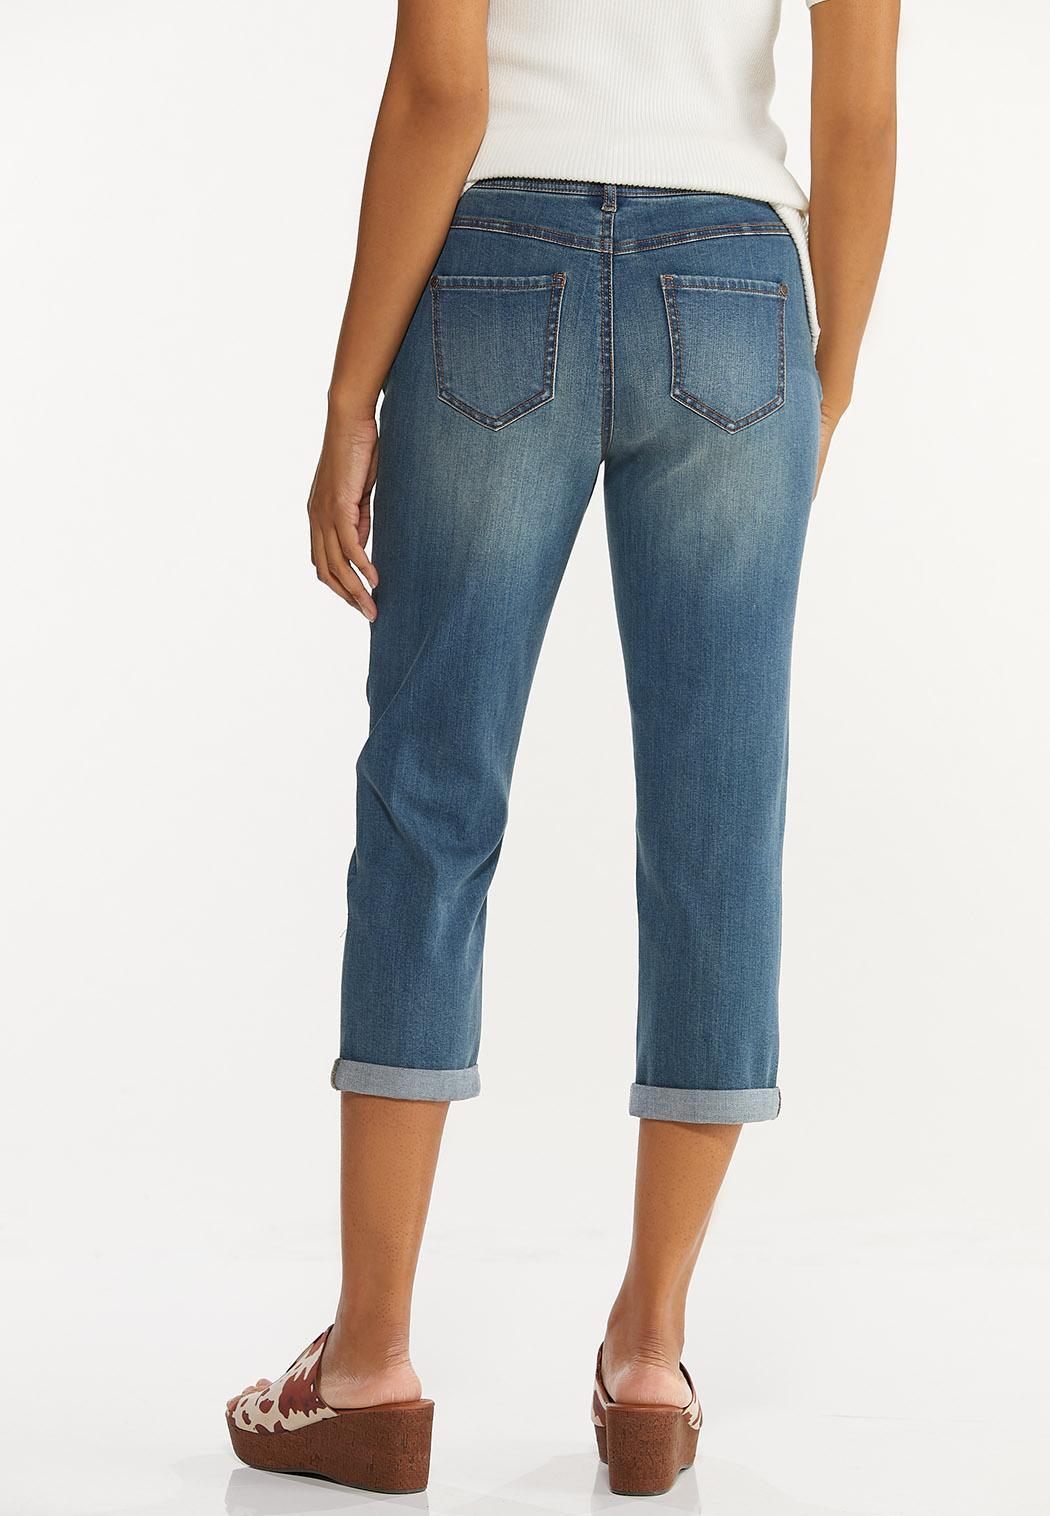 Girlfriend Cropped Jeans (Item #44521842)